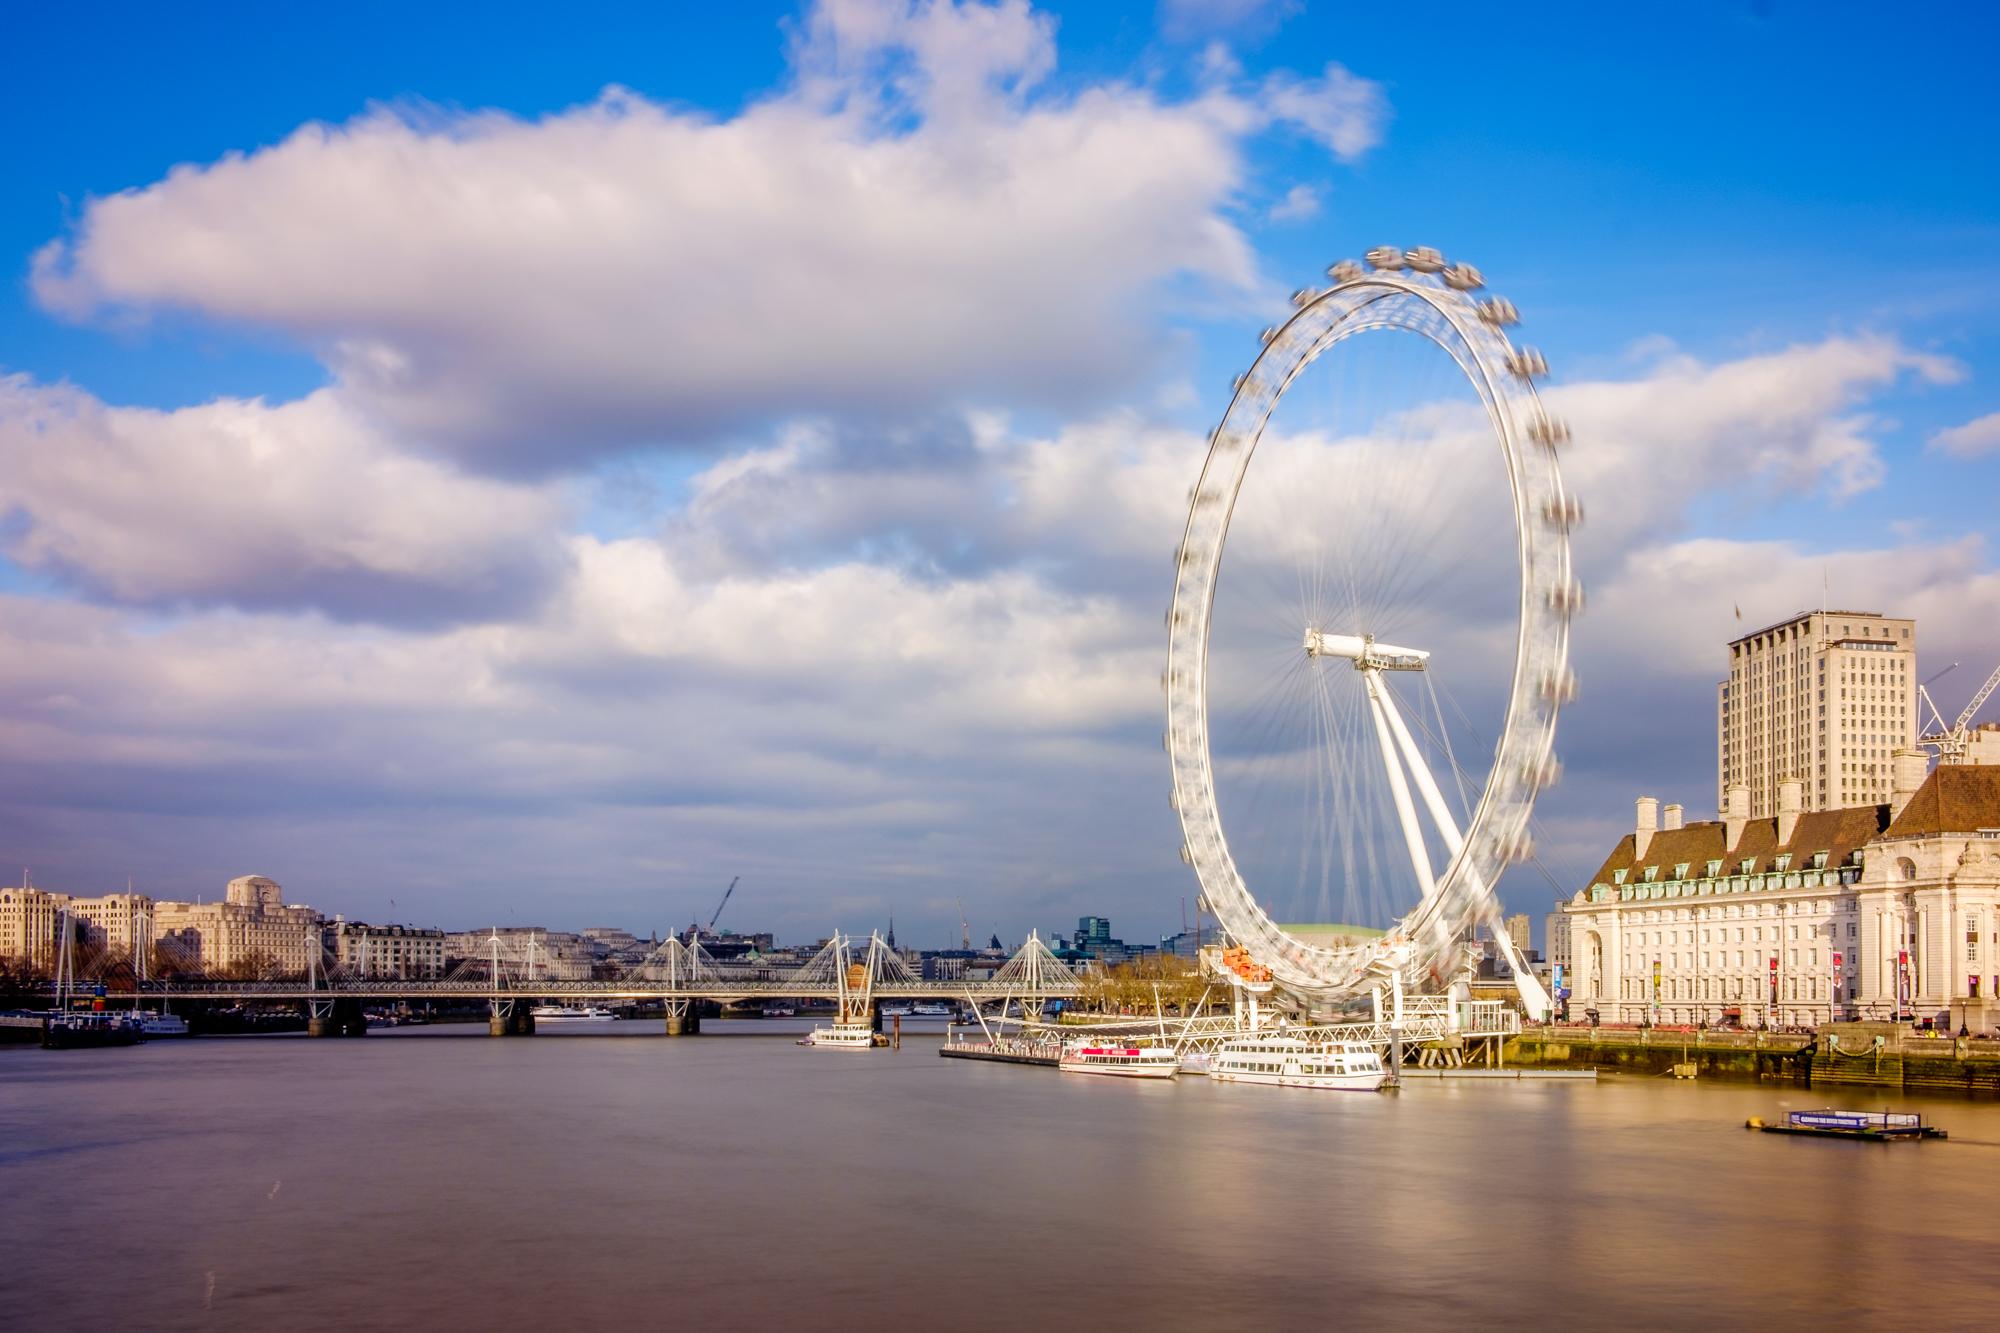 A photo of The London Eye in the golden sun taken by Trevor Sherwin